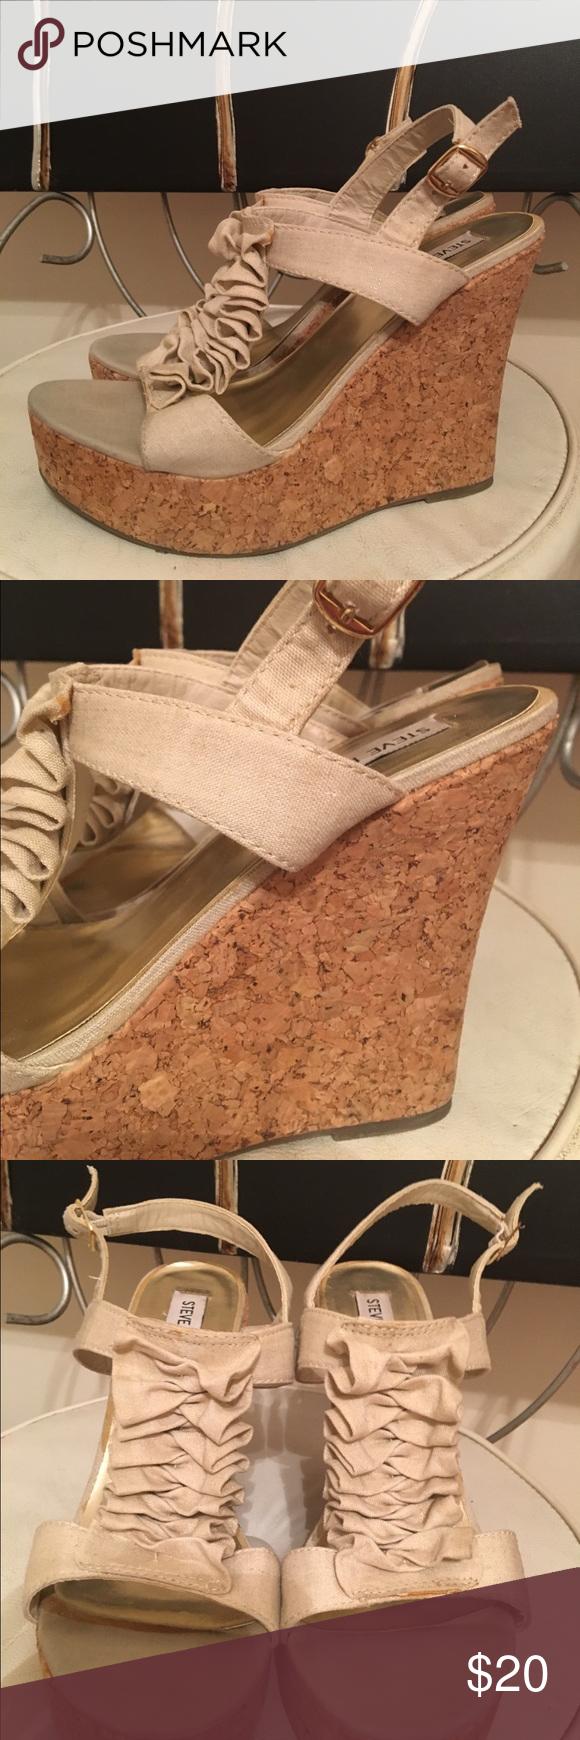 Steve Madden wedges😄 Gorgeous Steve Madden cream color cork wedges size 7.5 medium ❤ Steve Madden Shoes Wedges